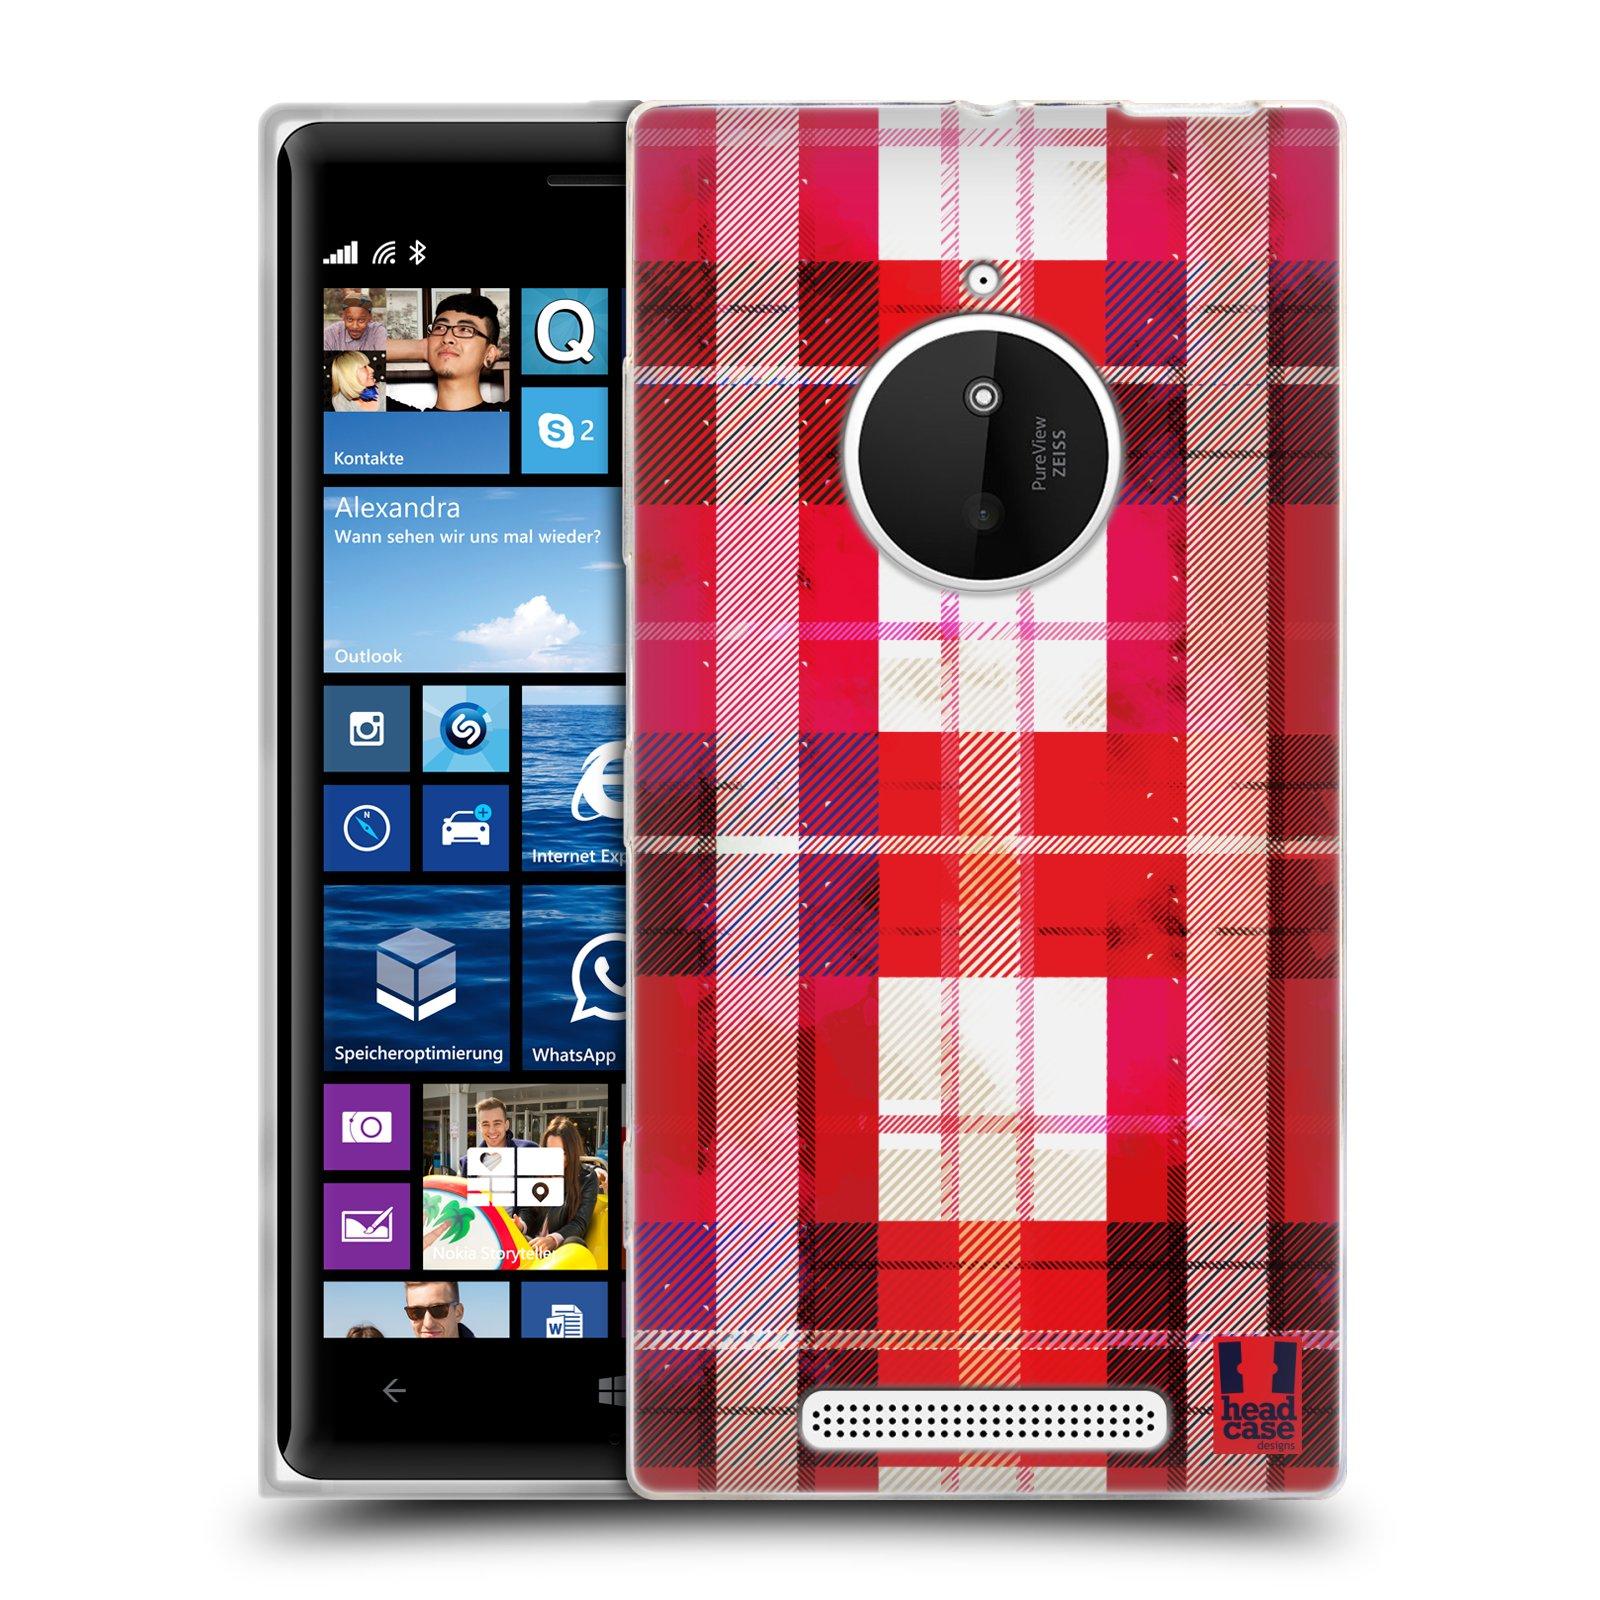 Silikonové pouzdro na mobil Nokia Lumia 830 HEAD CASE FLANEL RED (Silikonový kryt či obal na mobilní telefon Nokia Lumia 830)